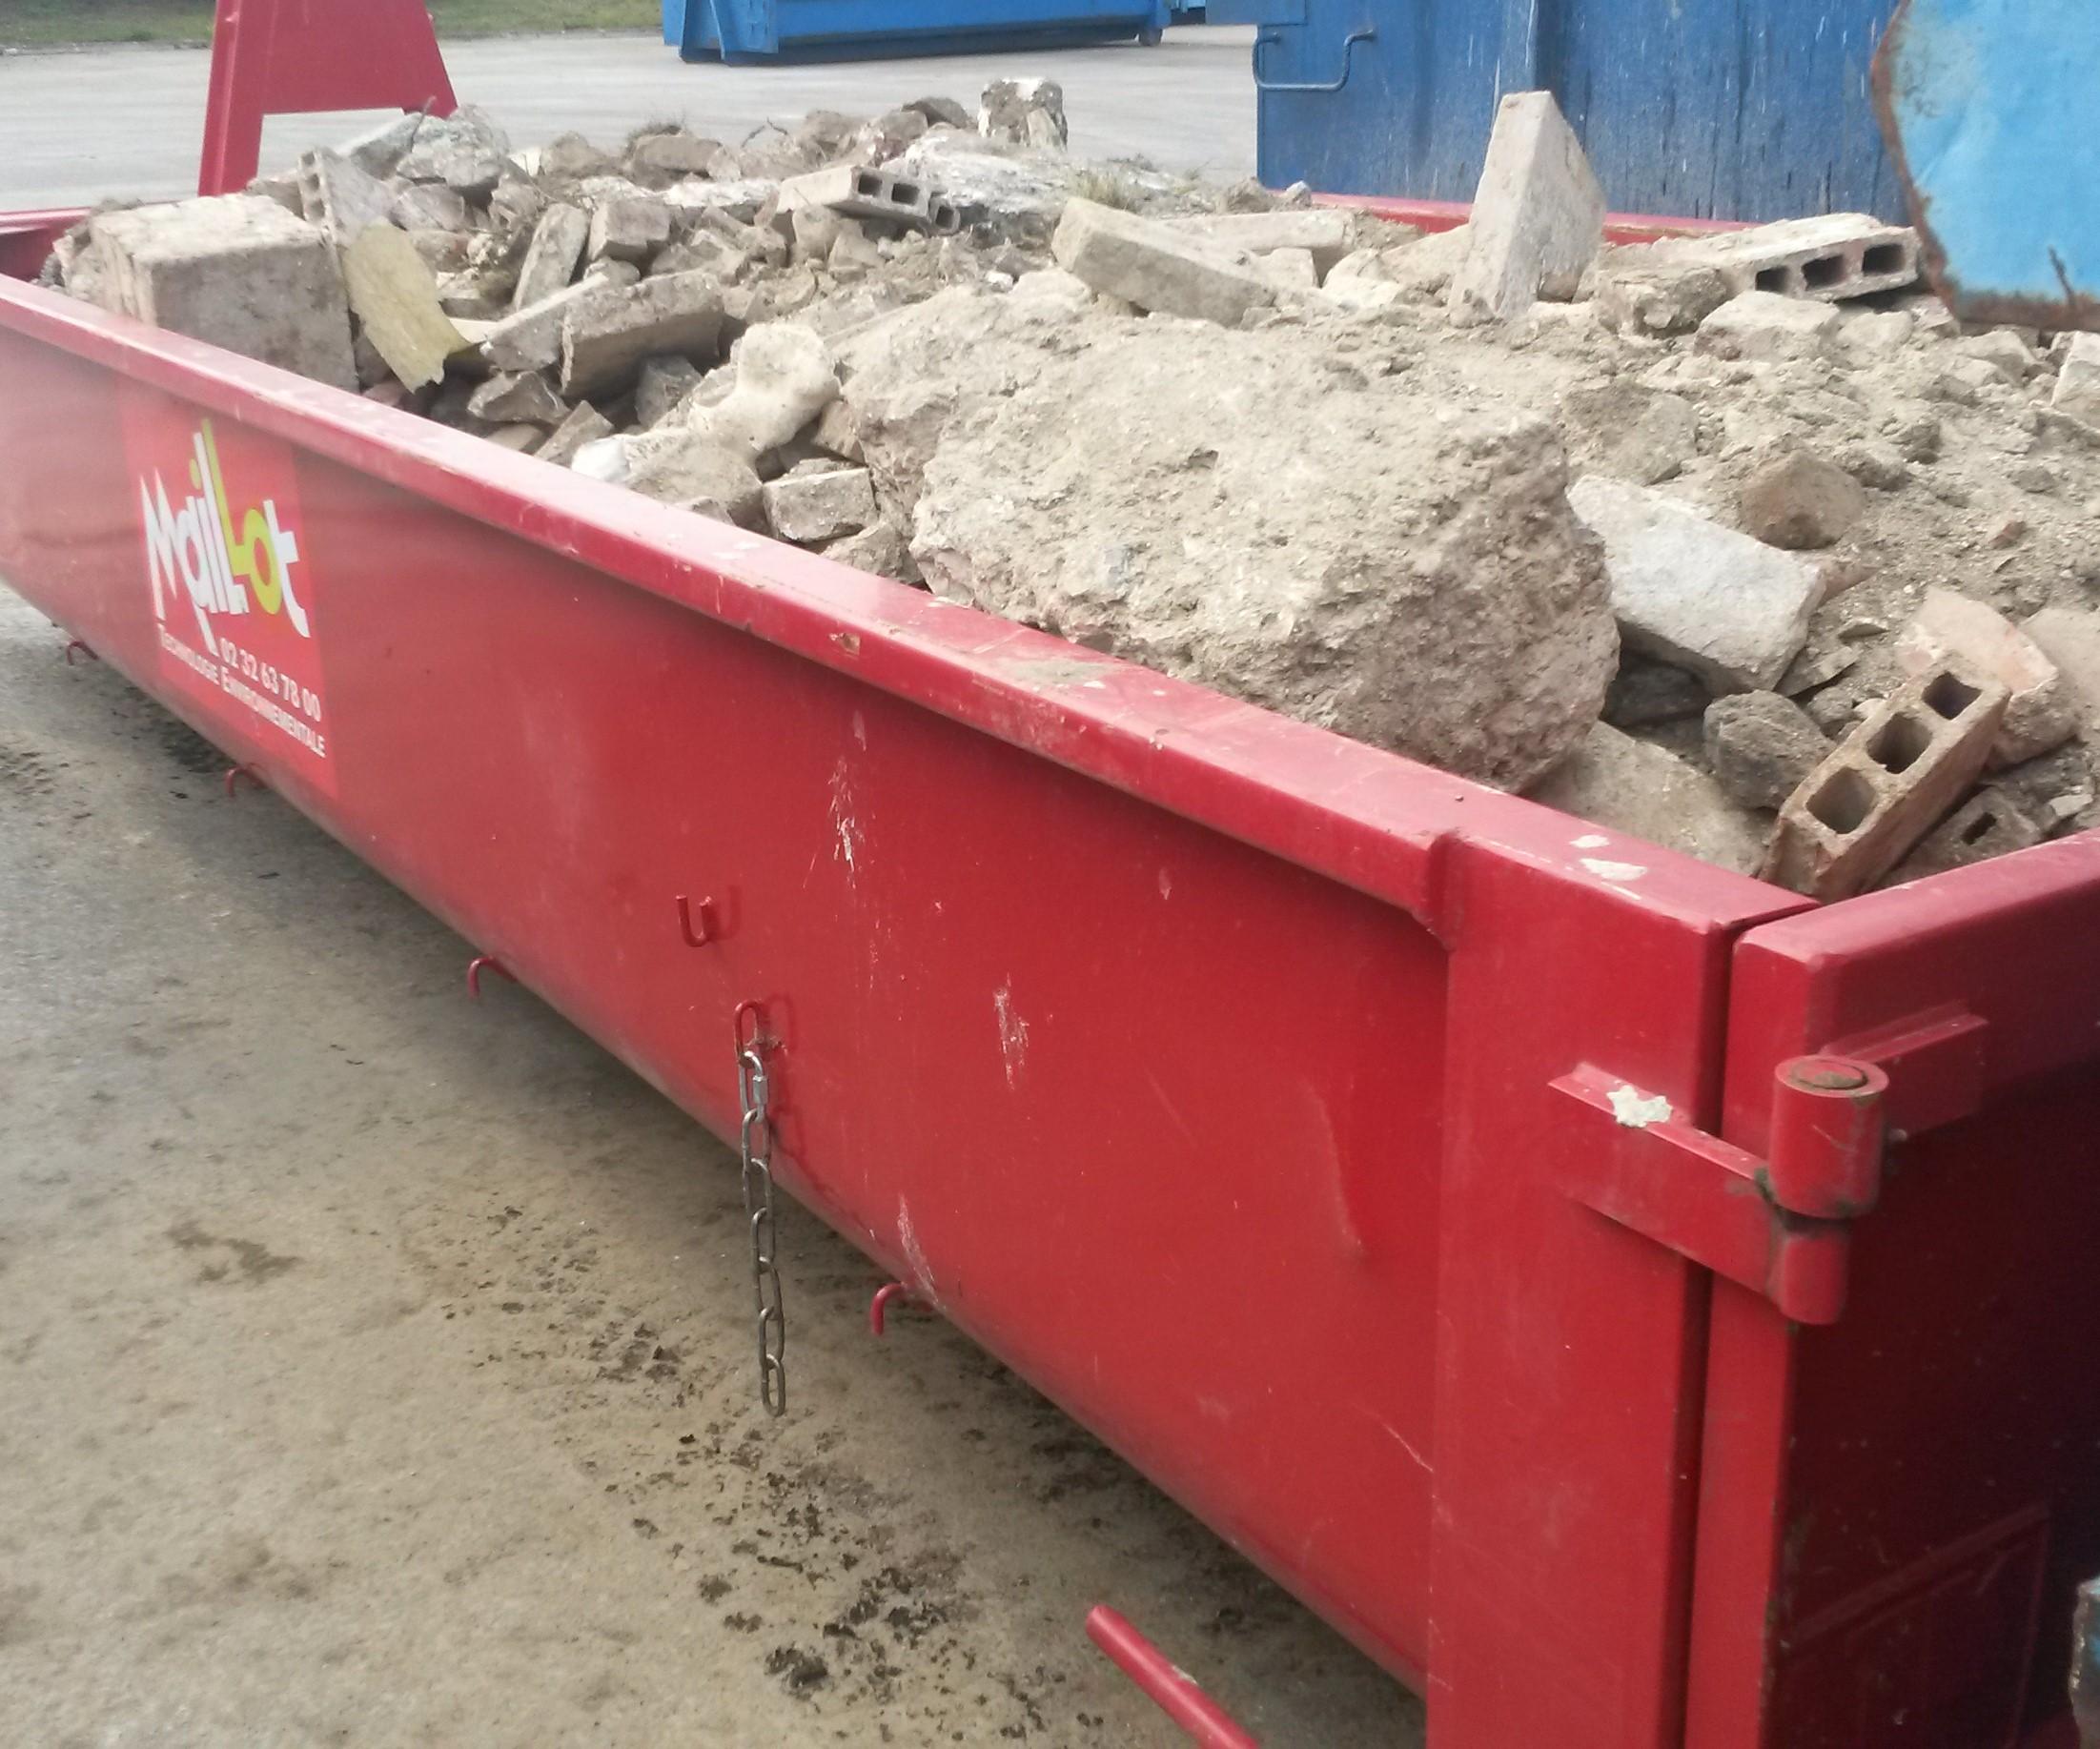 déchets industriels en benne